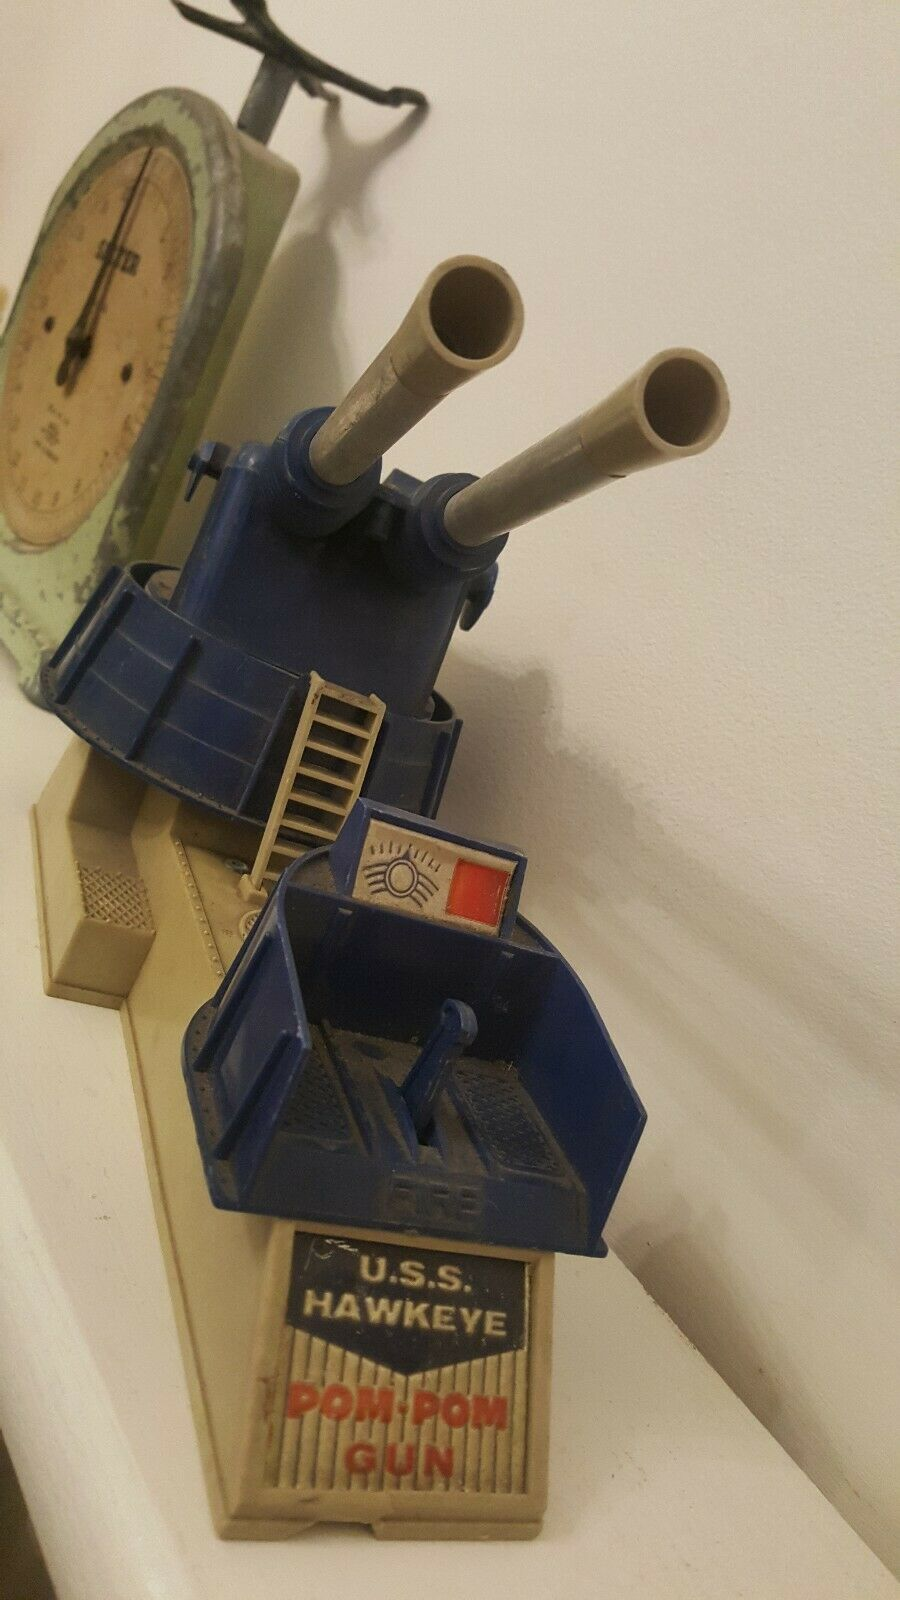 1960s Retro Vintage USS Hawkeye Pom-Pom Gun Military Toy RARE